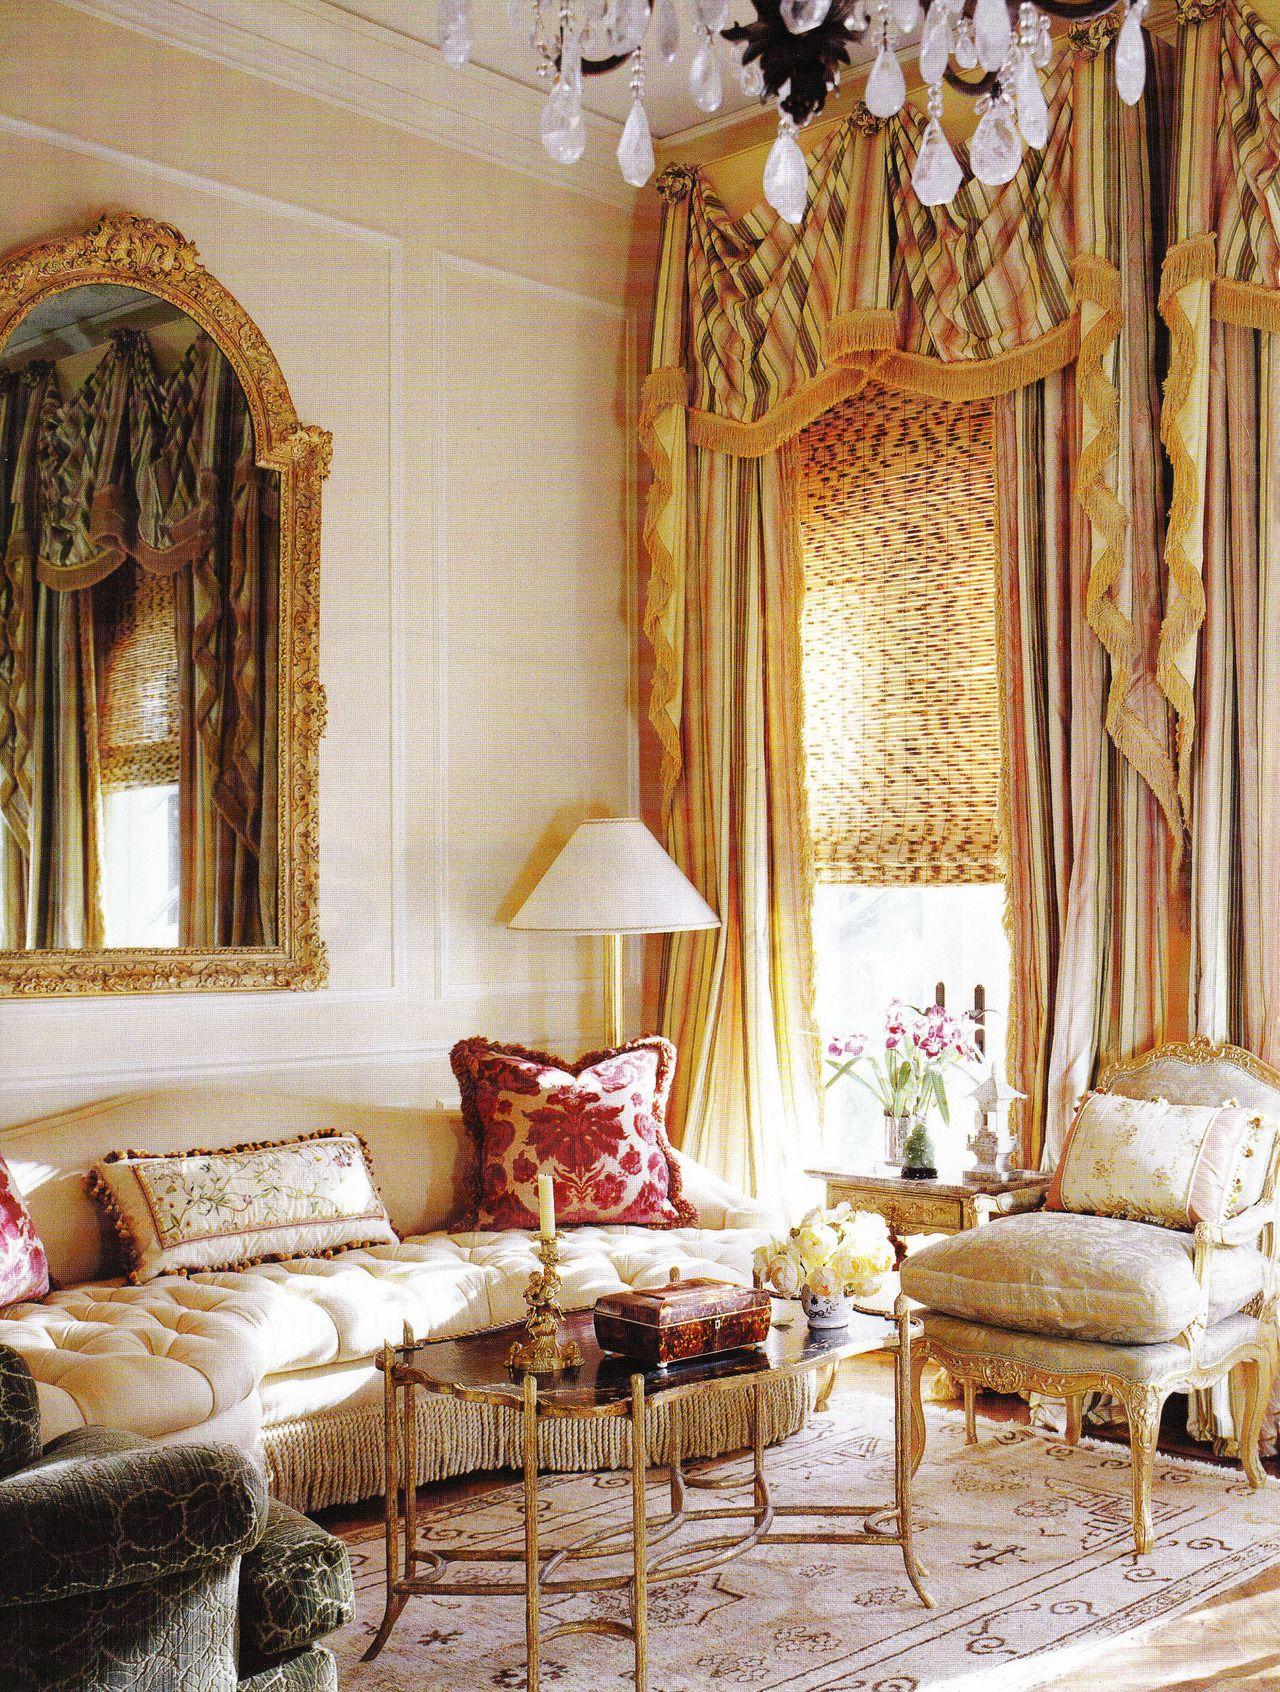 Exquisite decoraci n pinterest sill n antiguo - Sillones estilo frances ...